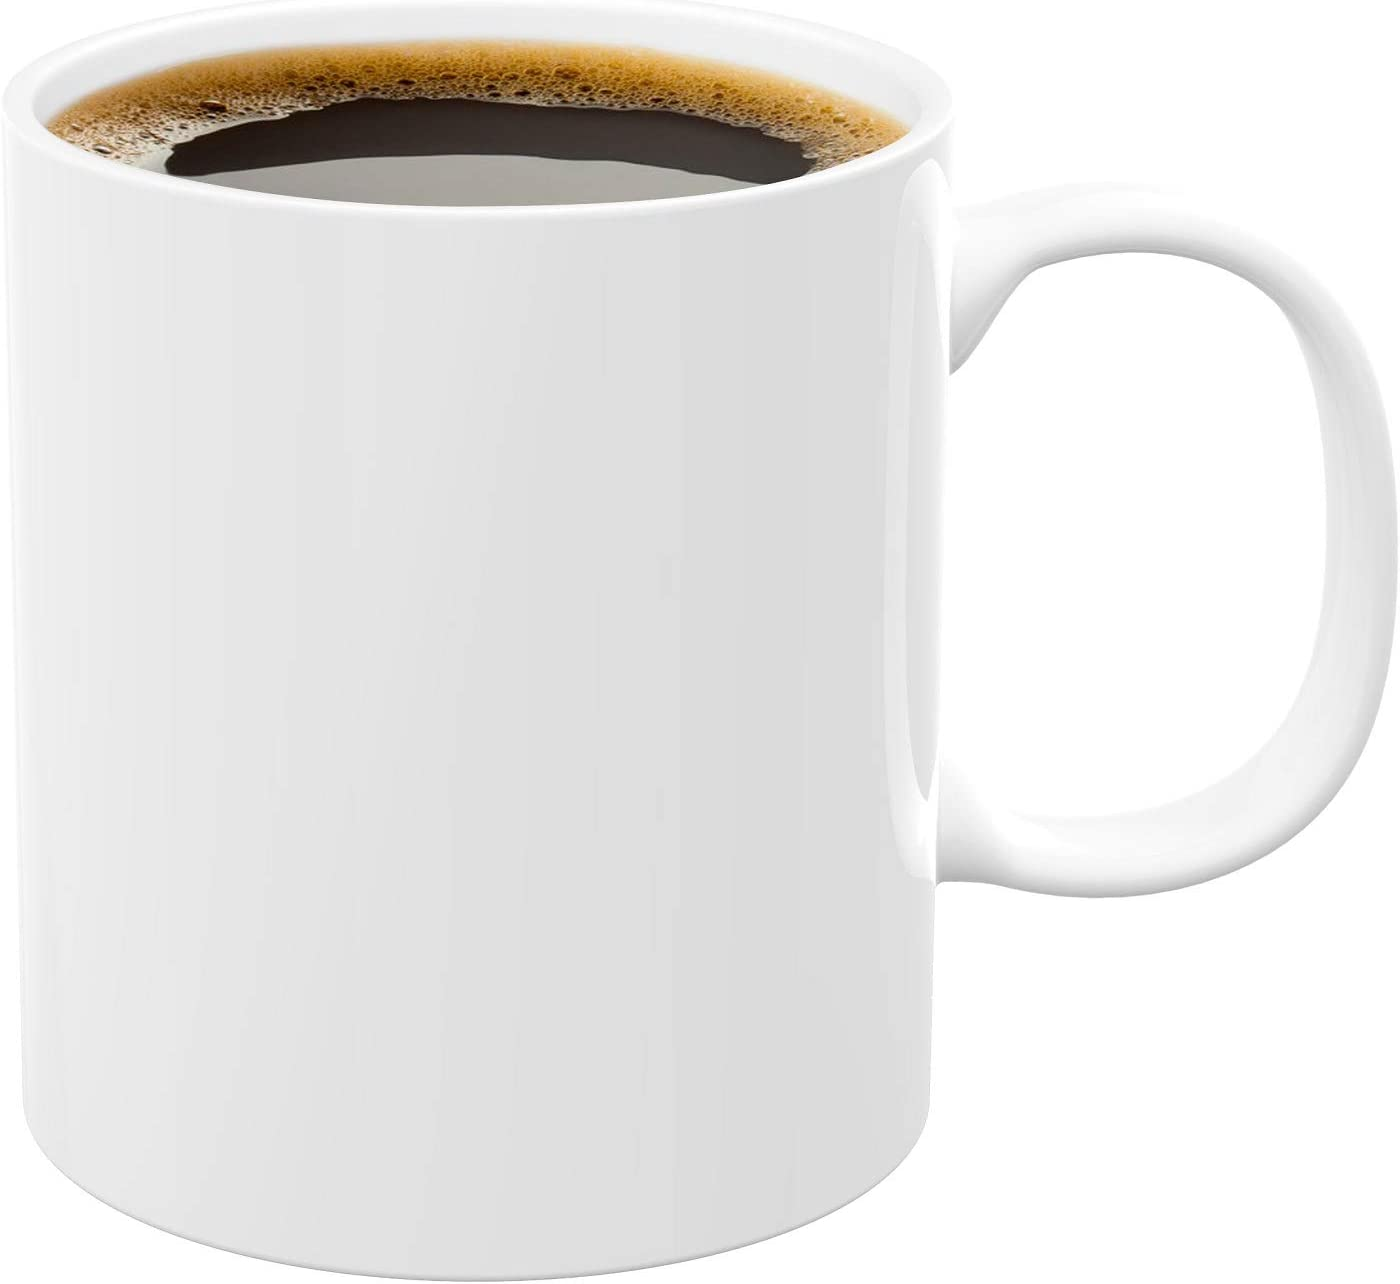 Coffee cup iwoxs Coffee Mug Warmer Replacement cup 430ml 14.5floz (white)